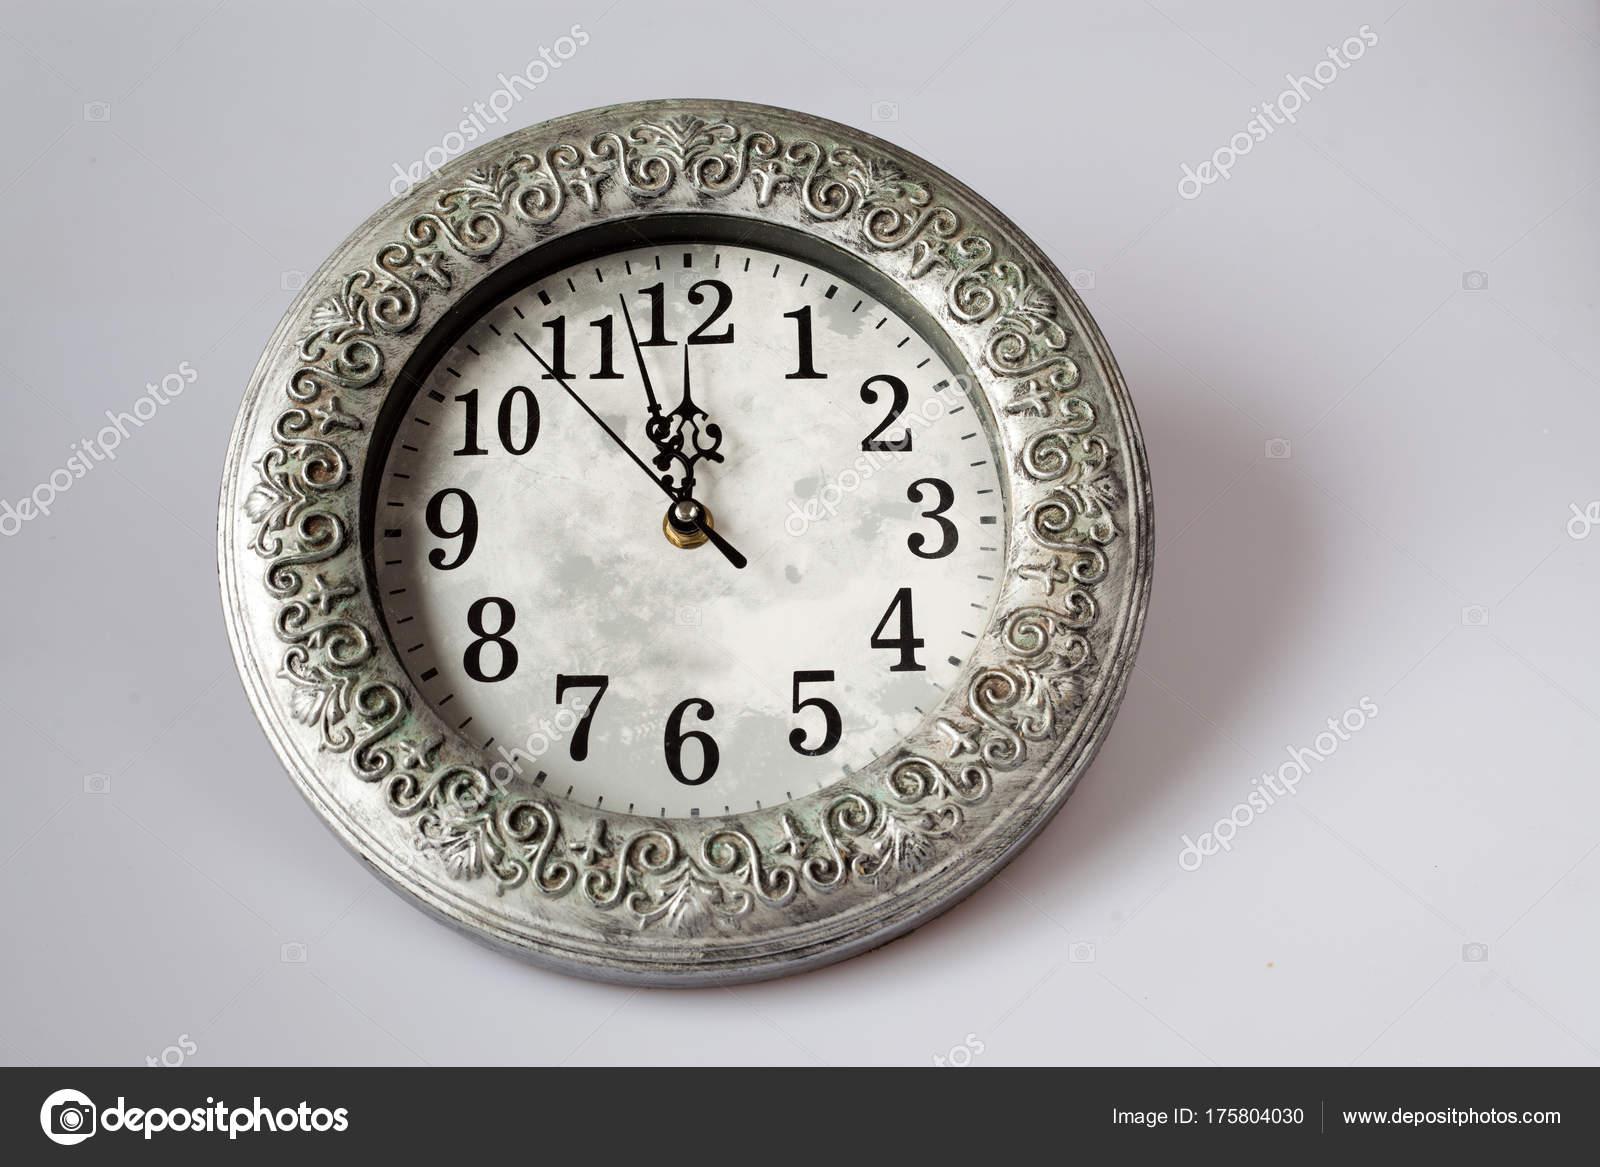 new Year\'s at midnight - clock at twelve o\'clock with holiday li ...